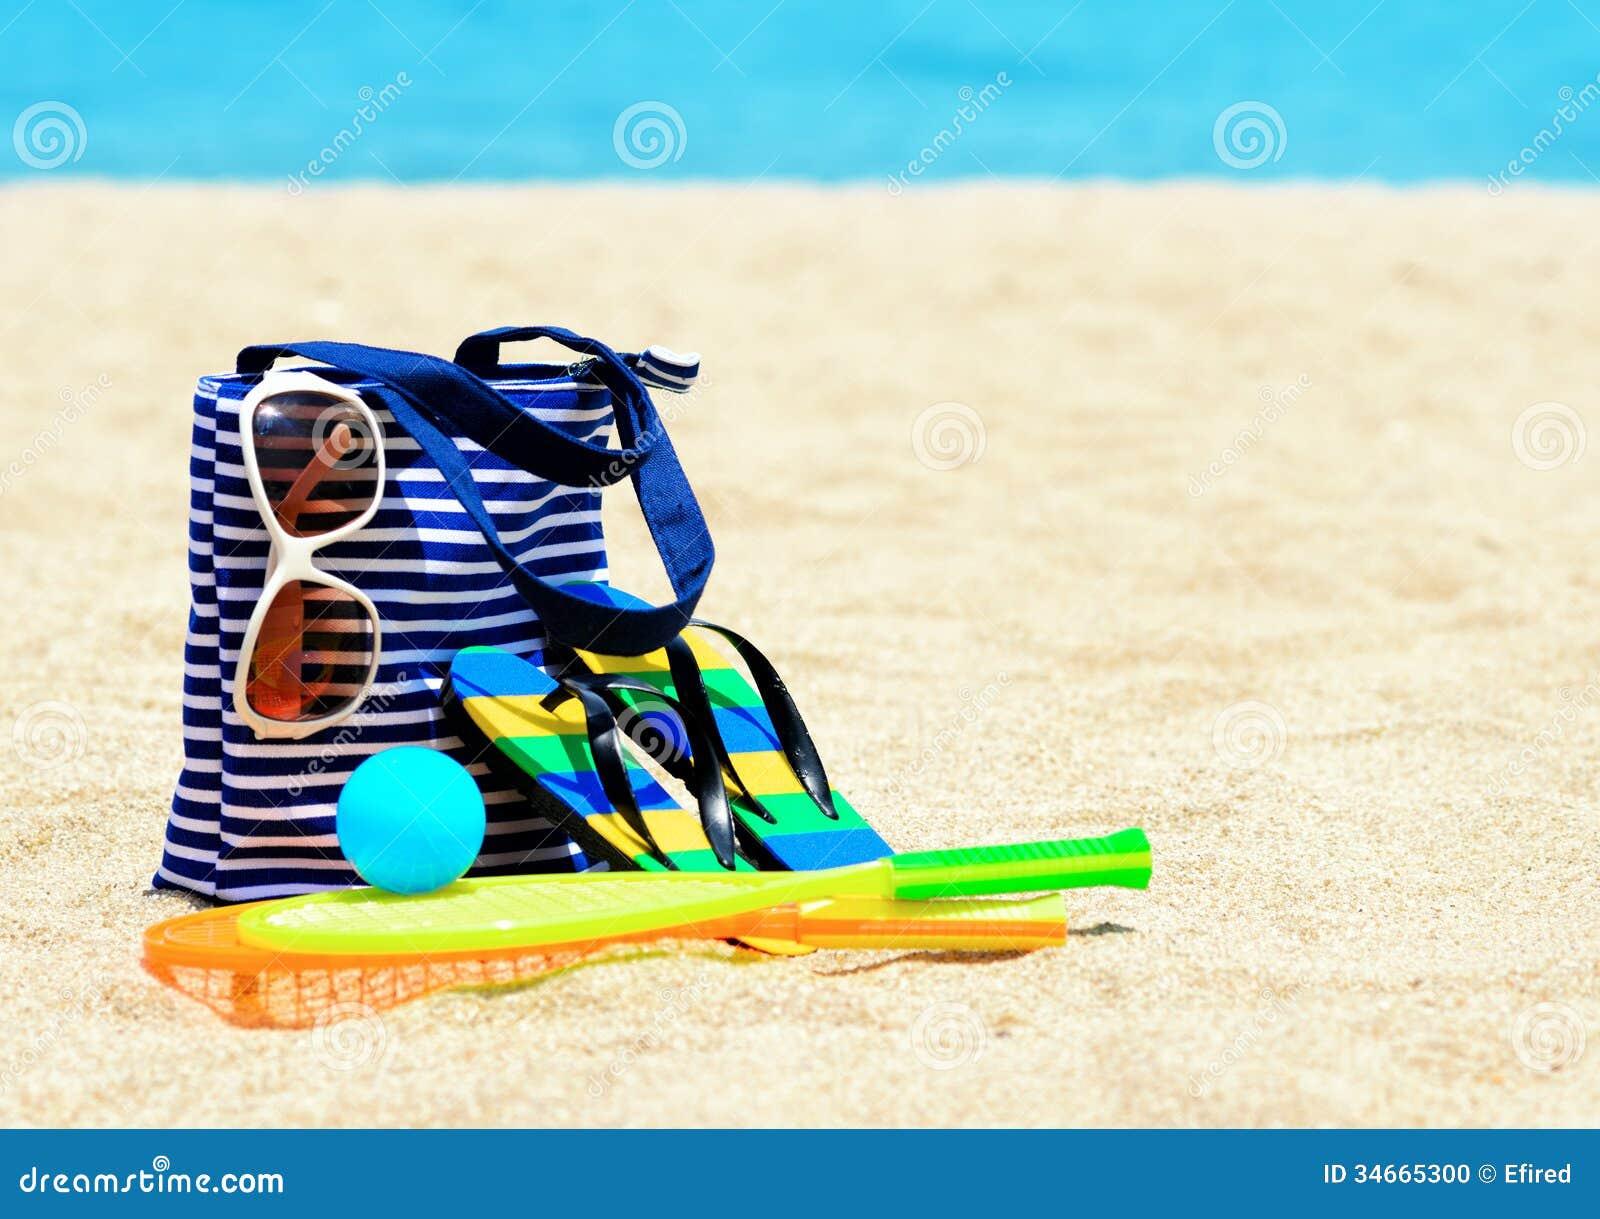 Beach Accessories. C